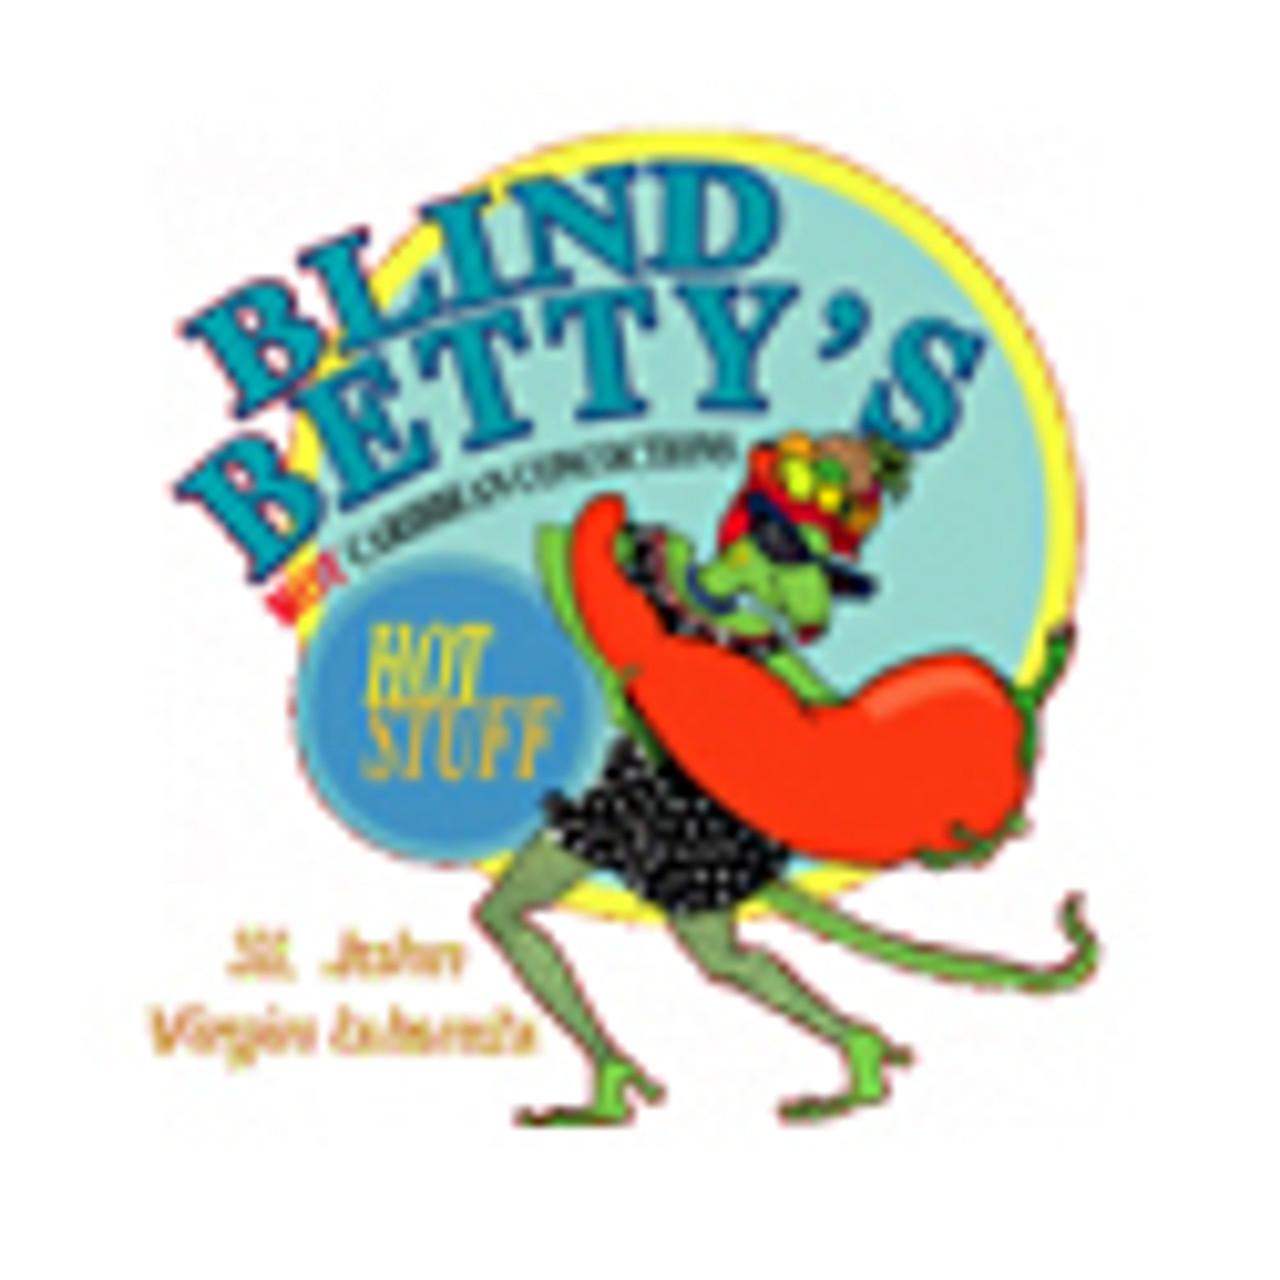 Blind Betty's